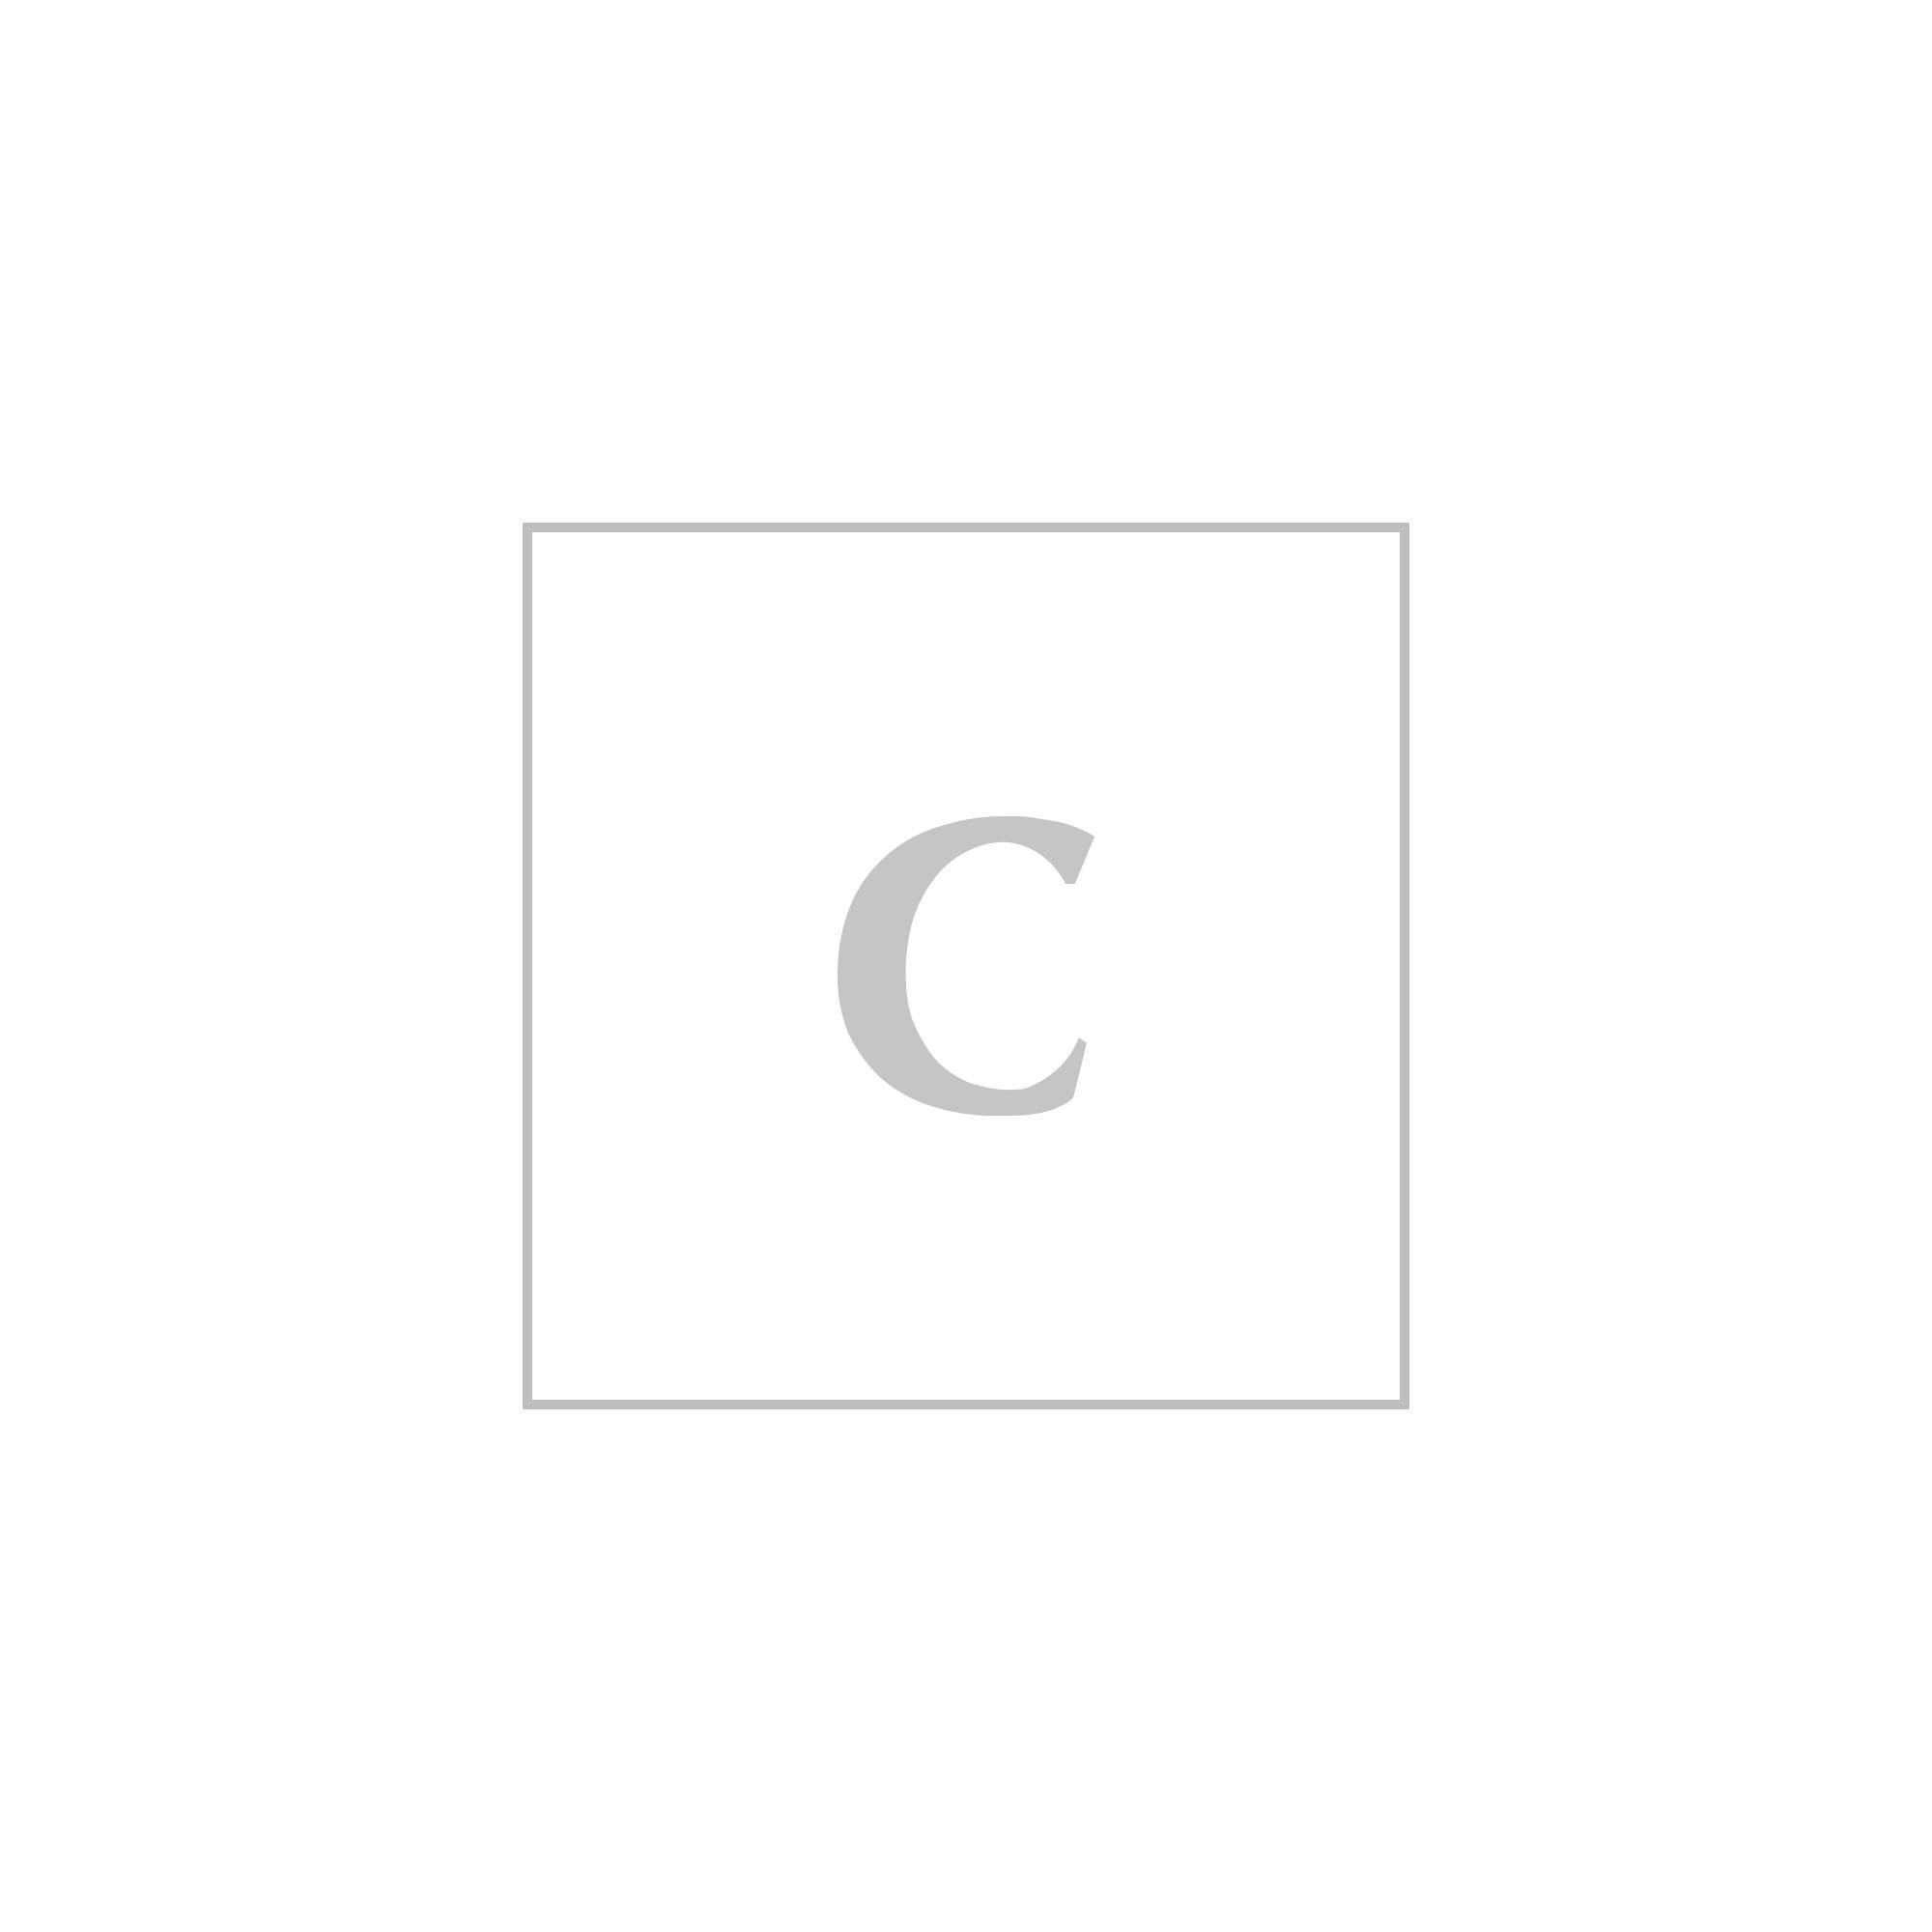 Dolce & gabbana calzatura derby spazzolato splendor